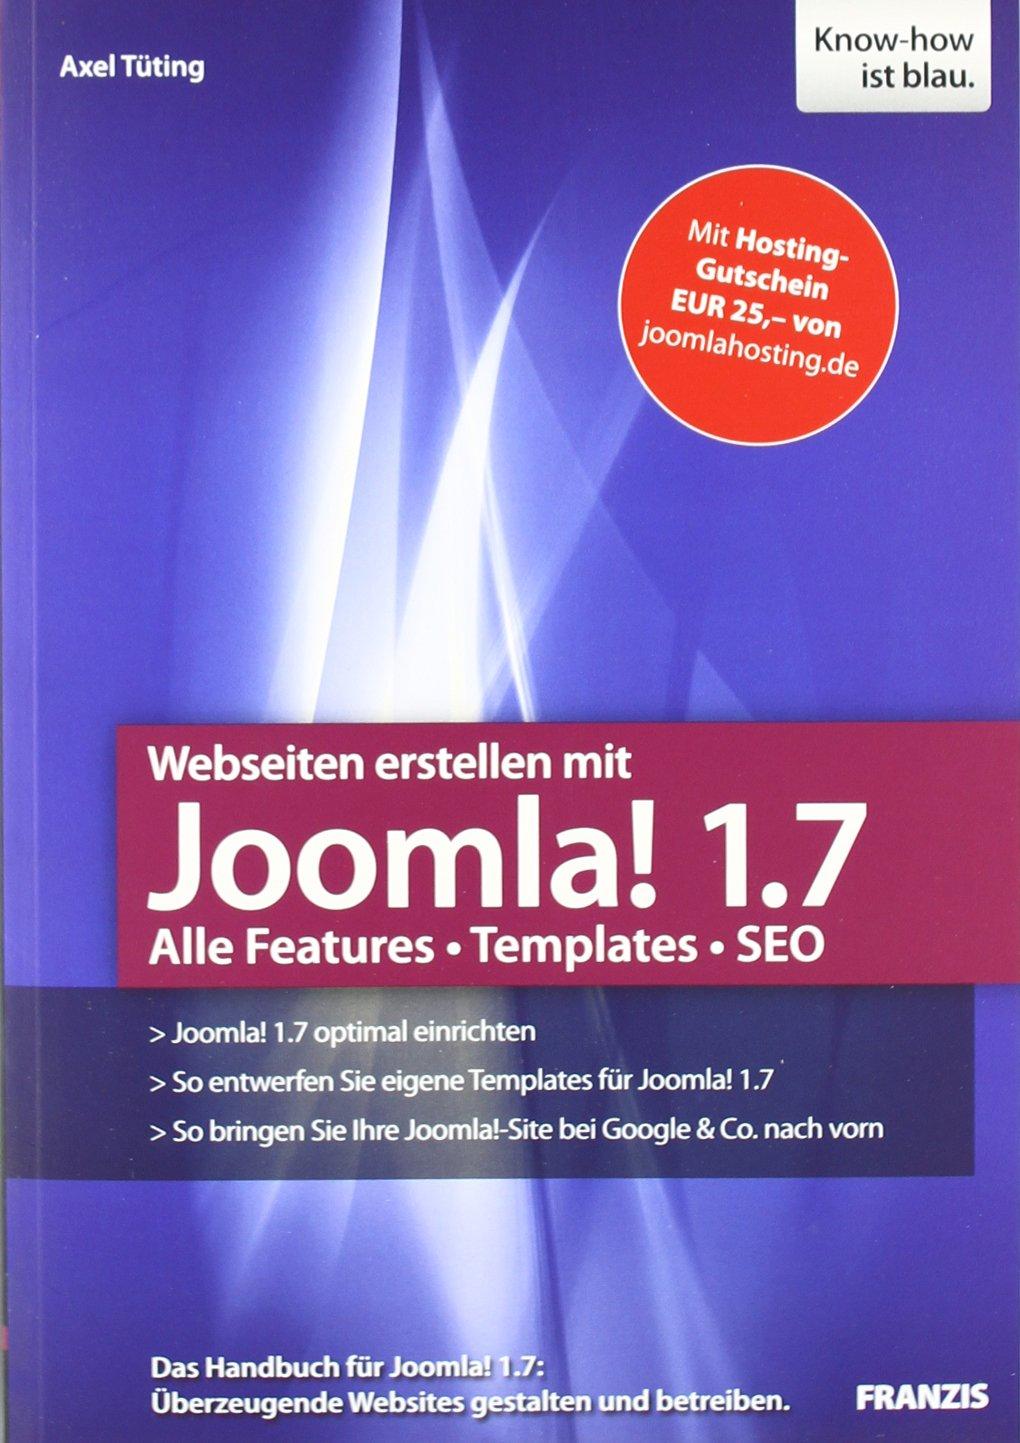 Webseiten erstellen mit Joomla! 1.7 Broschiert – 12. September 2011 Axel Tüting Franzis Verlag 3645601392 Content Management